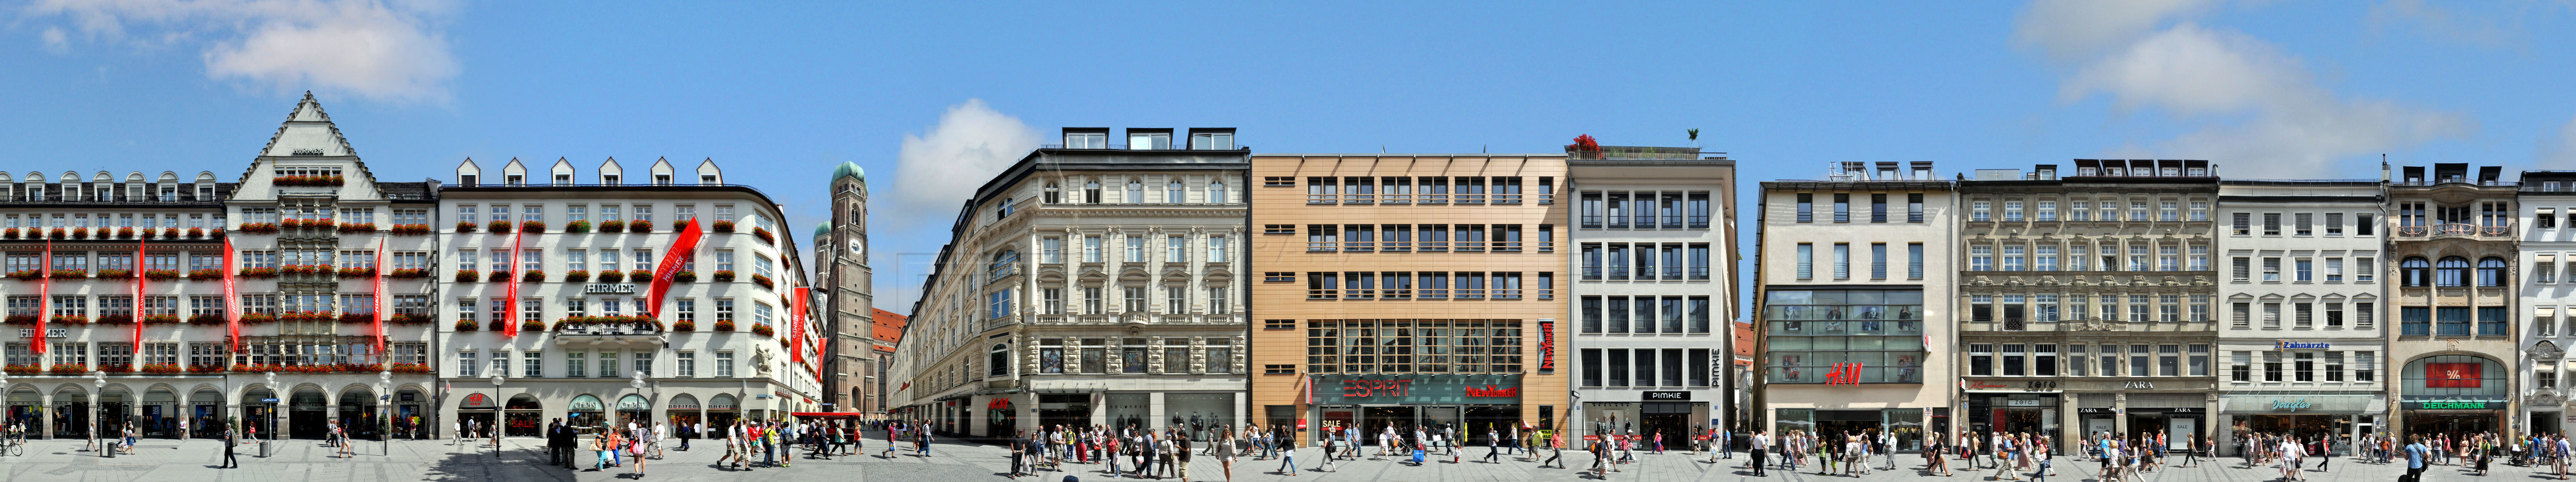 München Fassaden Panorama Zentrum Frauenkirche